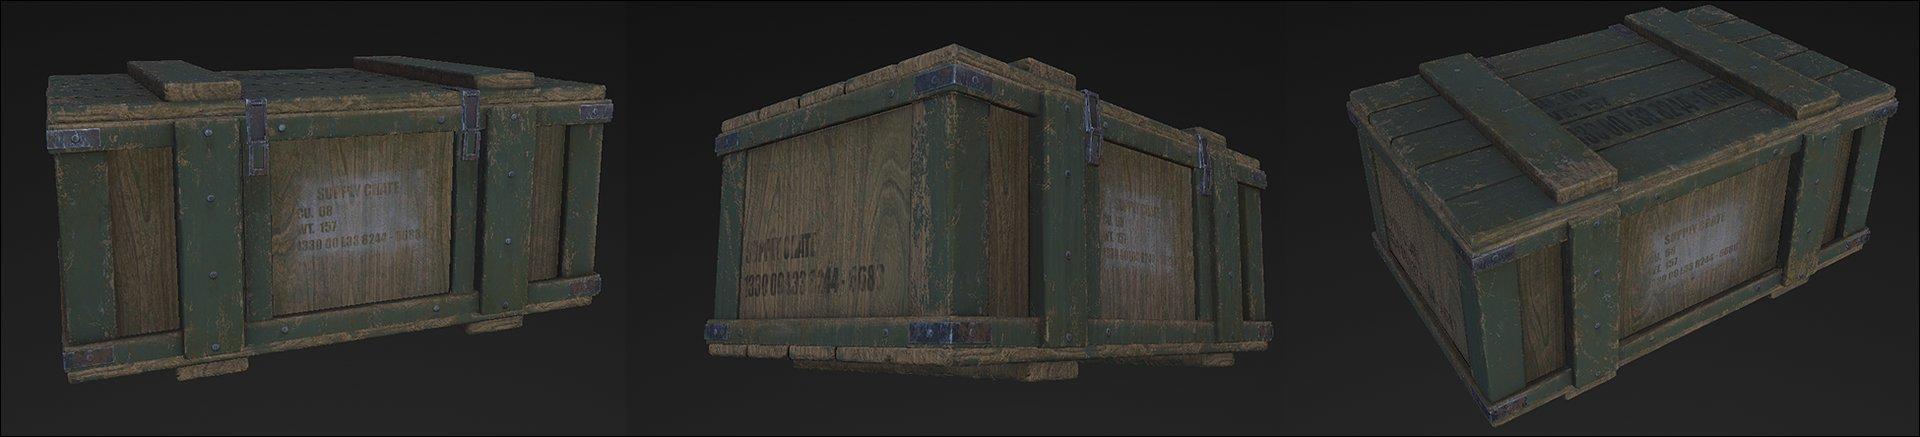 Daniel conroy crate 2 texture wip